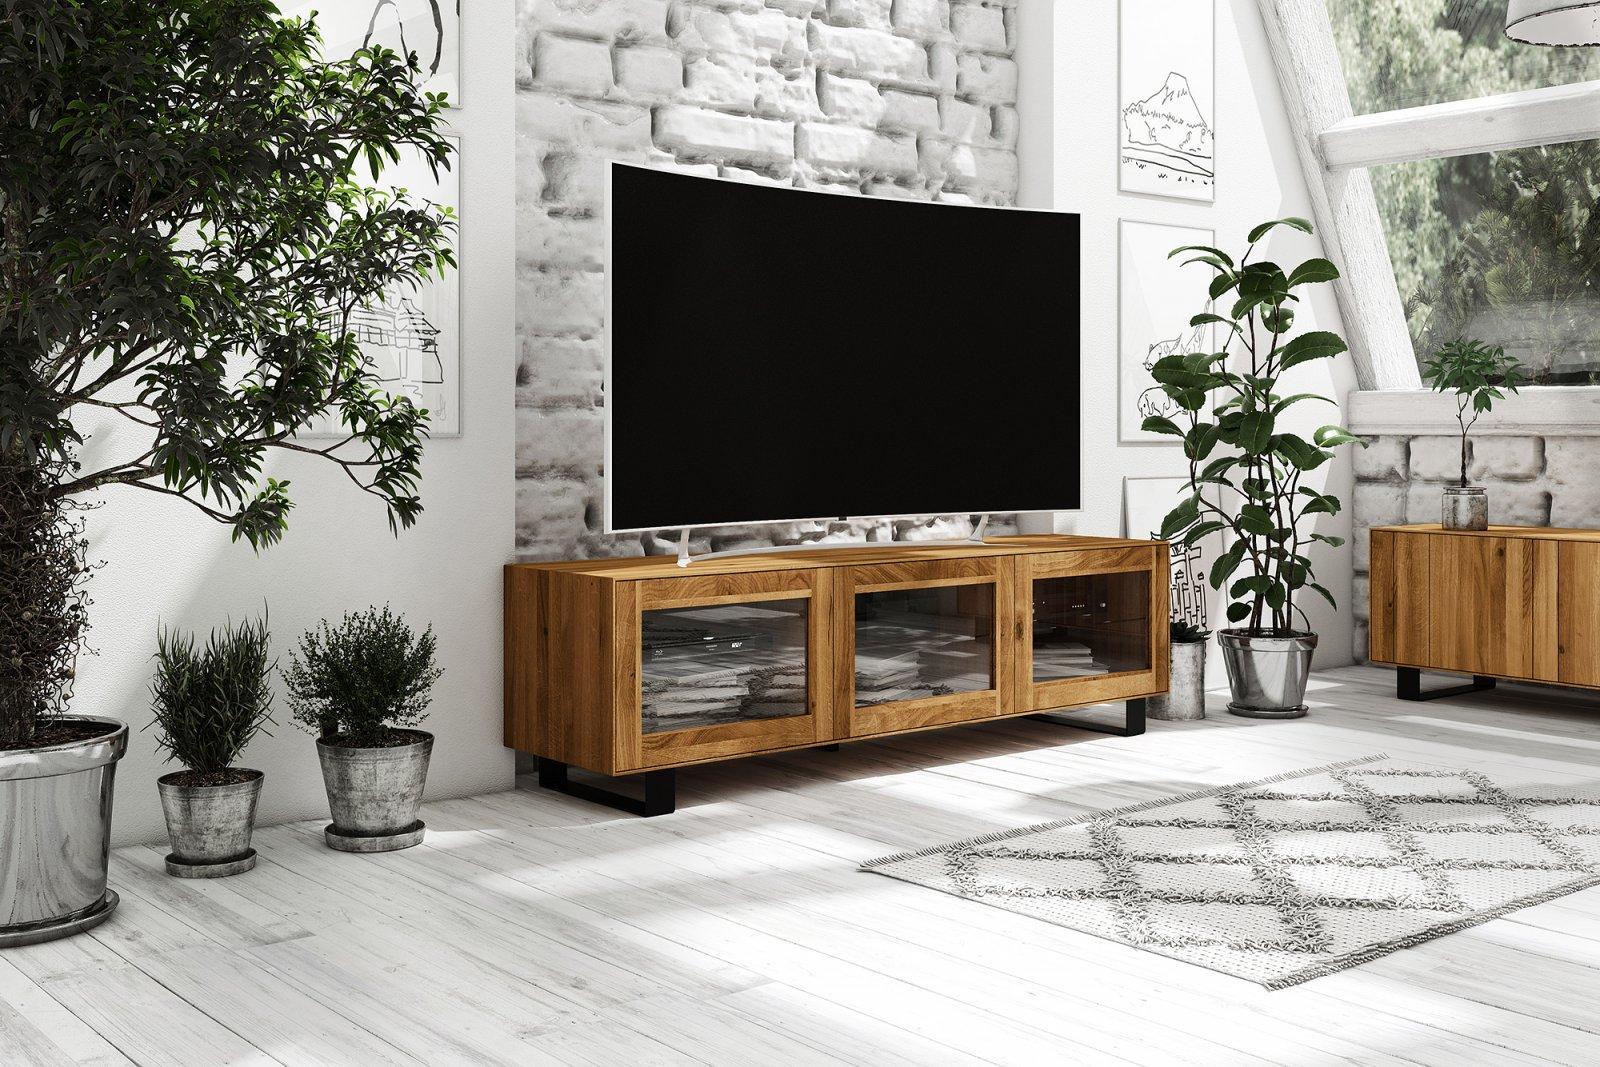 Szafka RTV STEEL z litego drewna